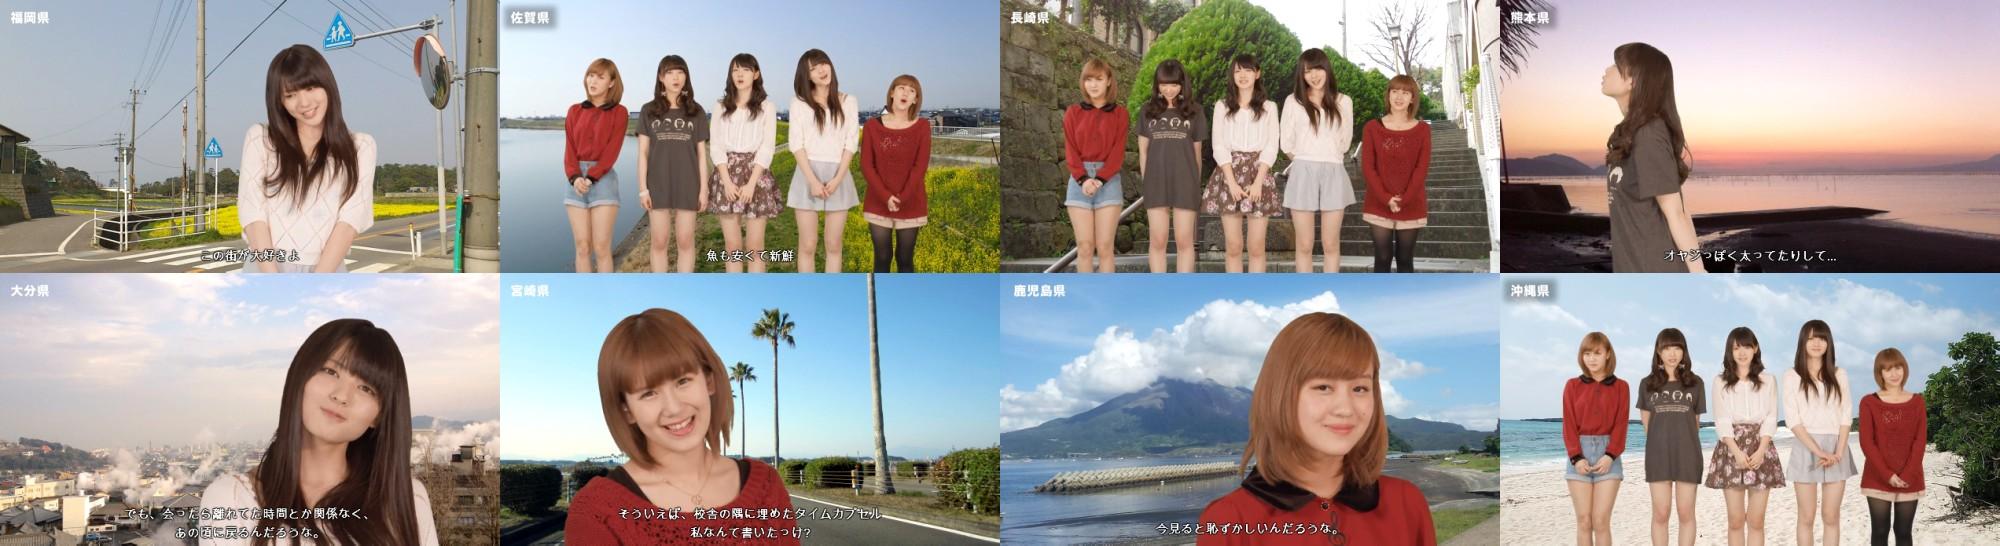 九州と沖縄地方